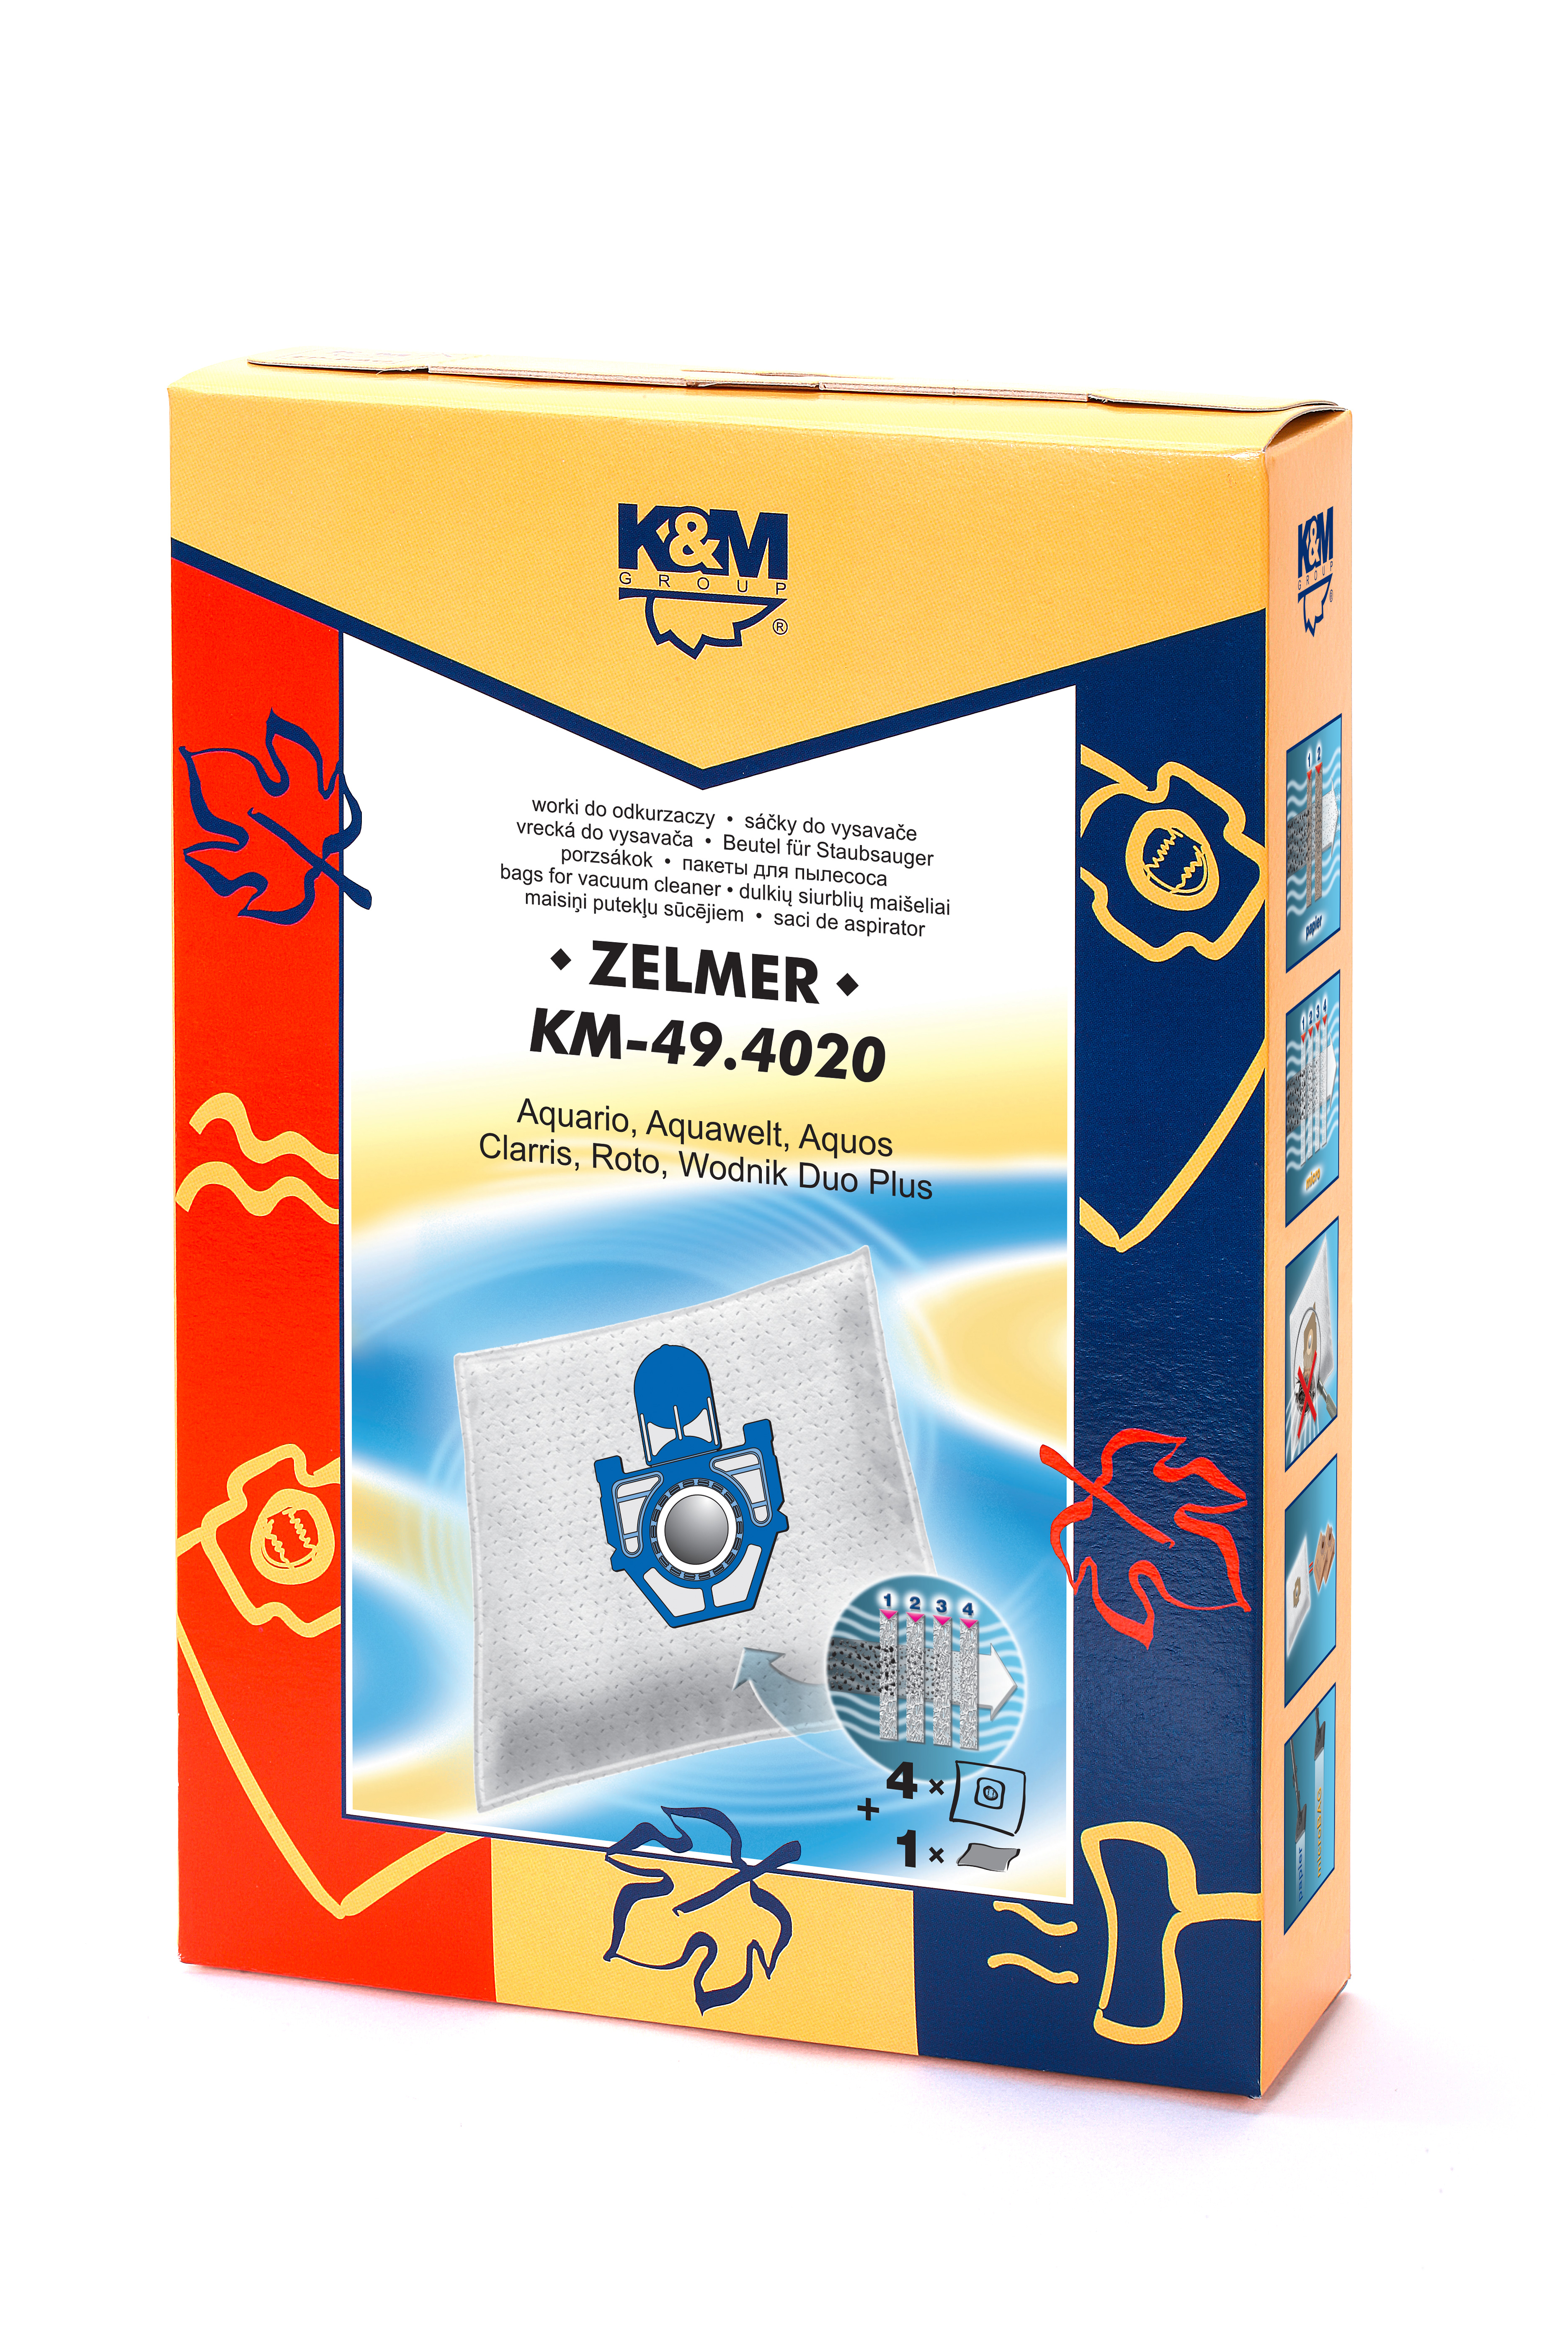 Sac aspirator pentru Zelmer, sintetic, 4 saci + 1 filtru, K&M [0]